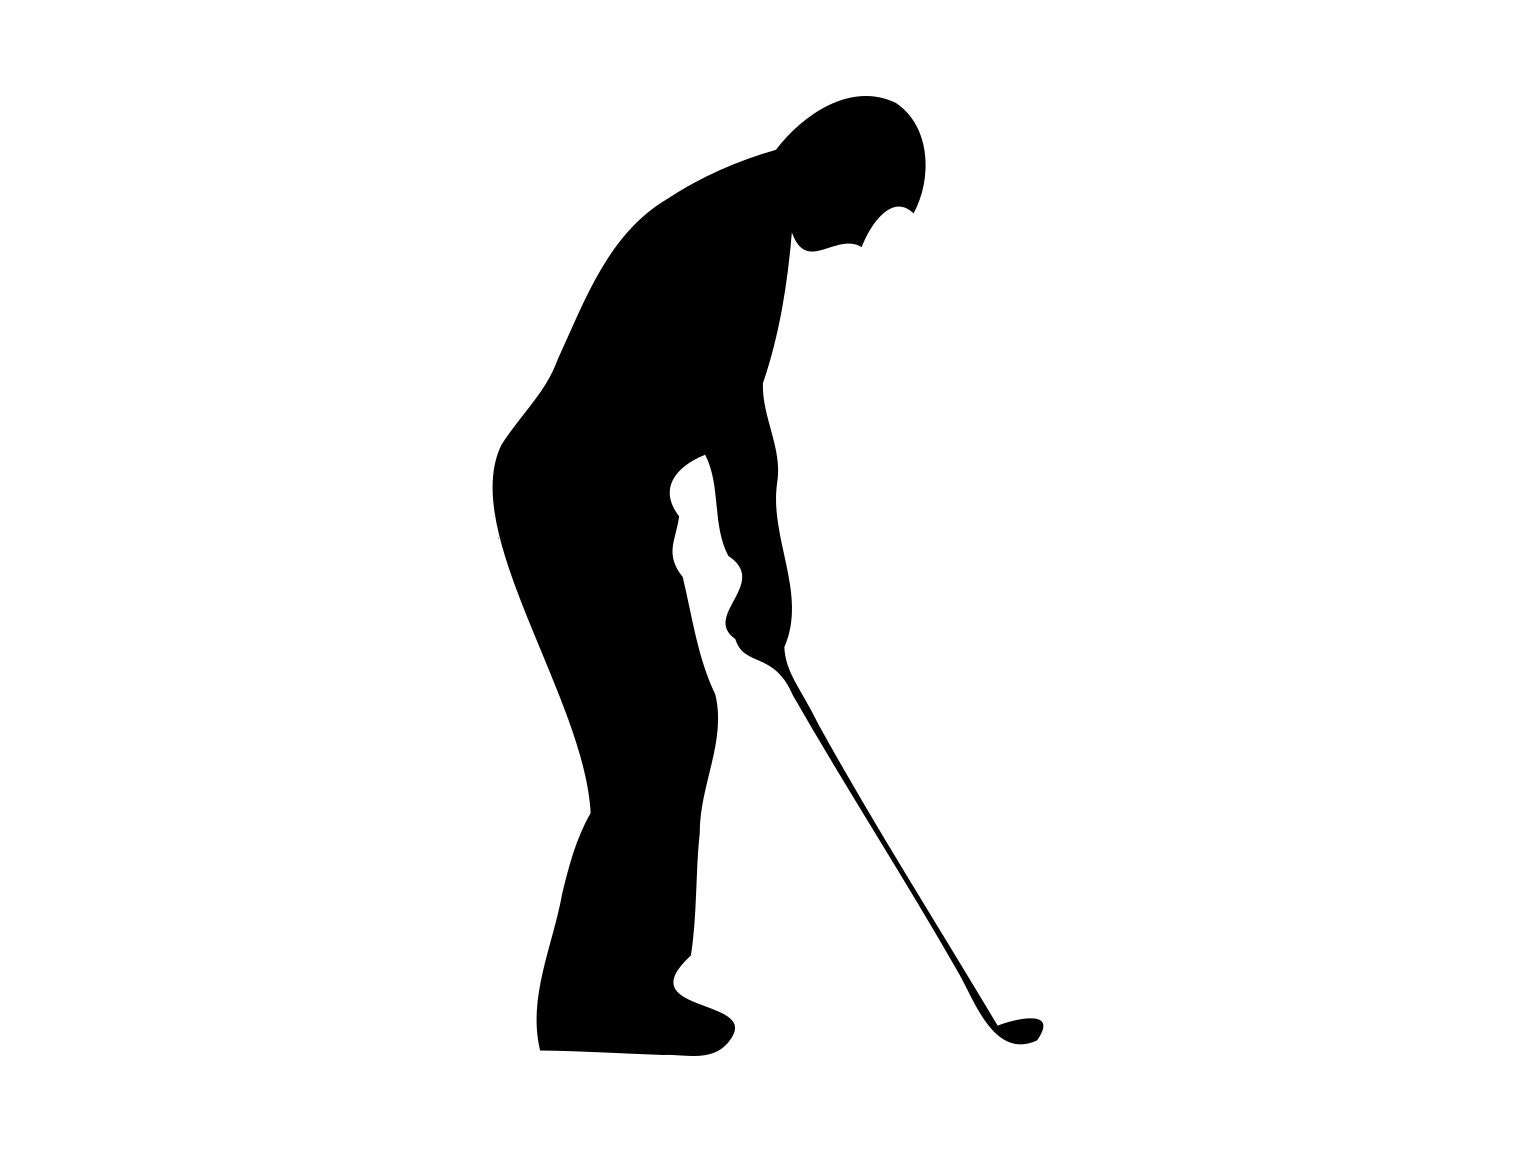 Golf Svg Dateien Golf Svg Golf Golf Clipart Vektor Golfer Svg Etsy